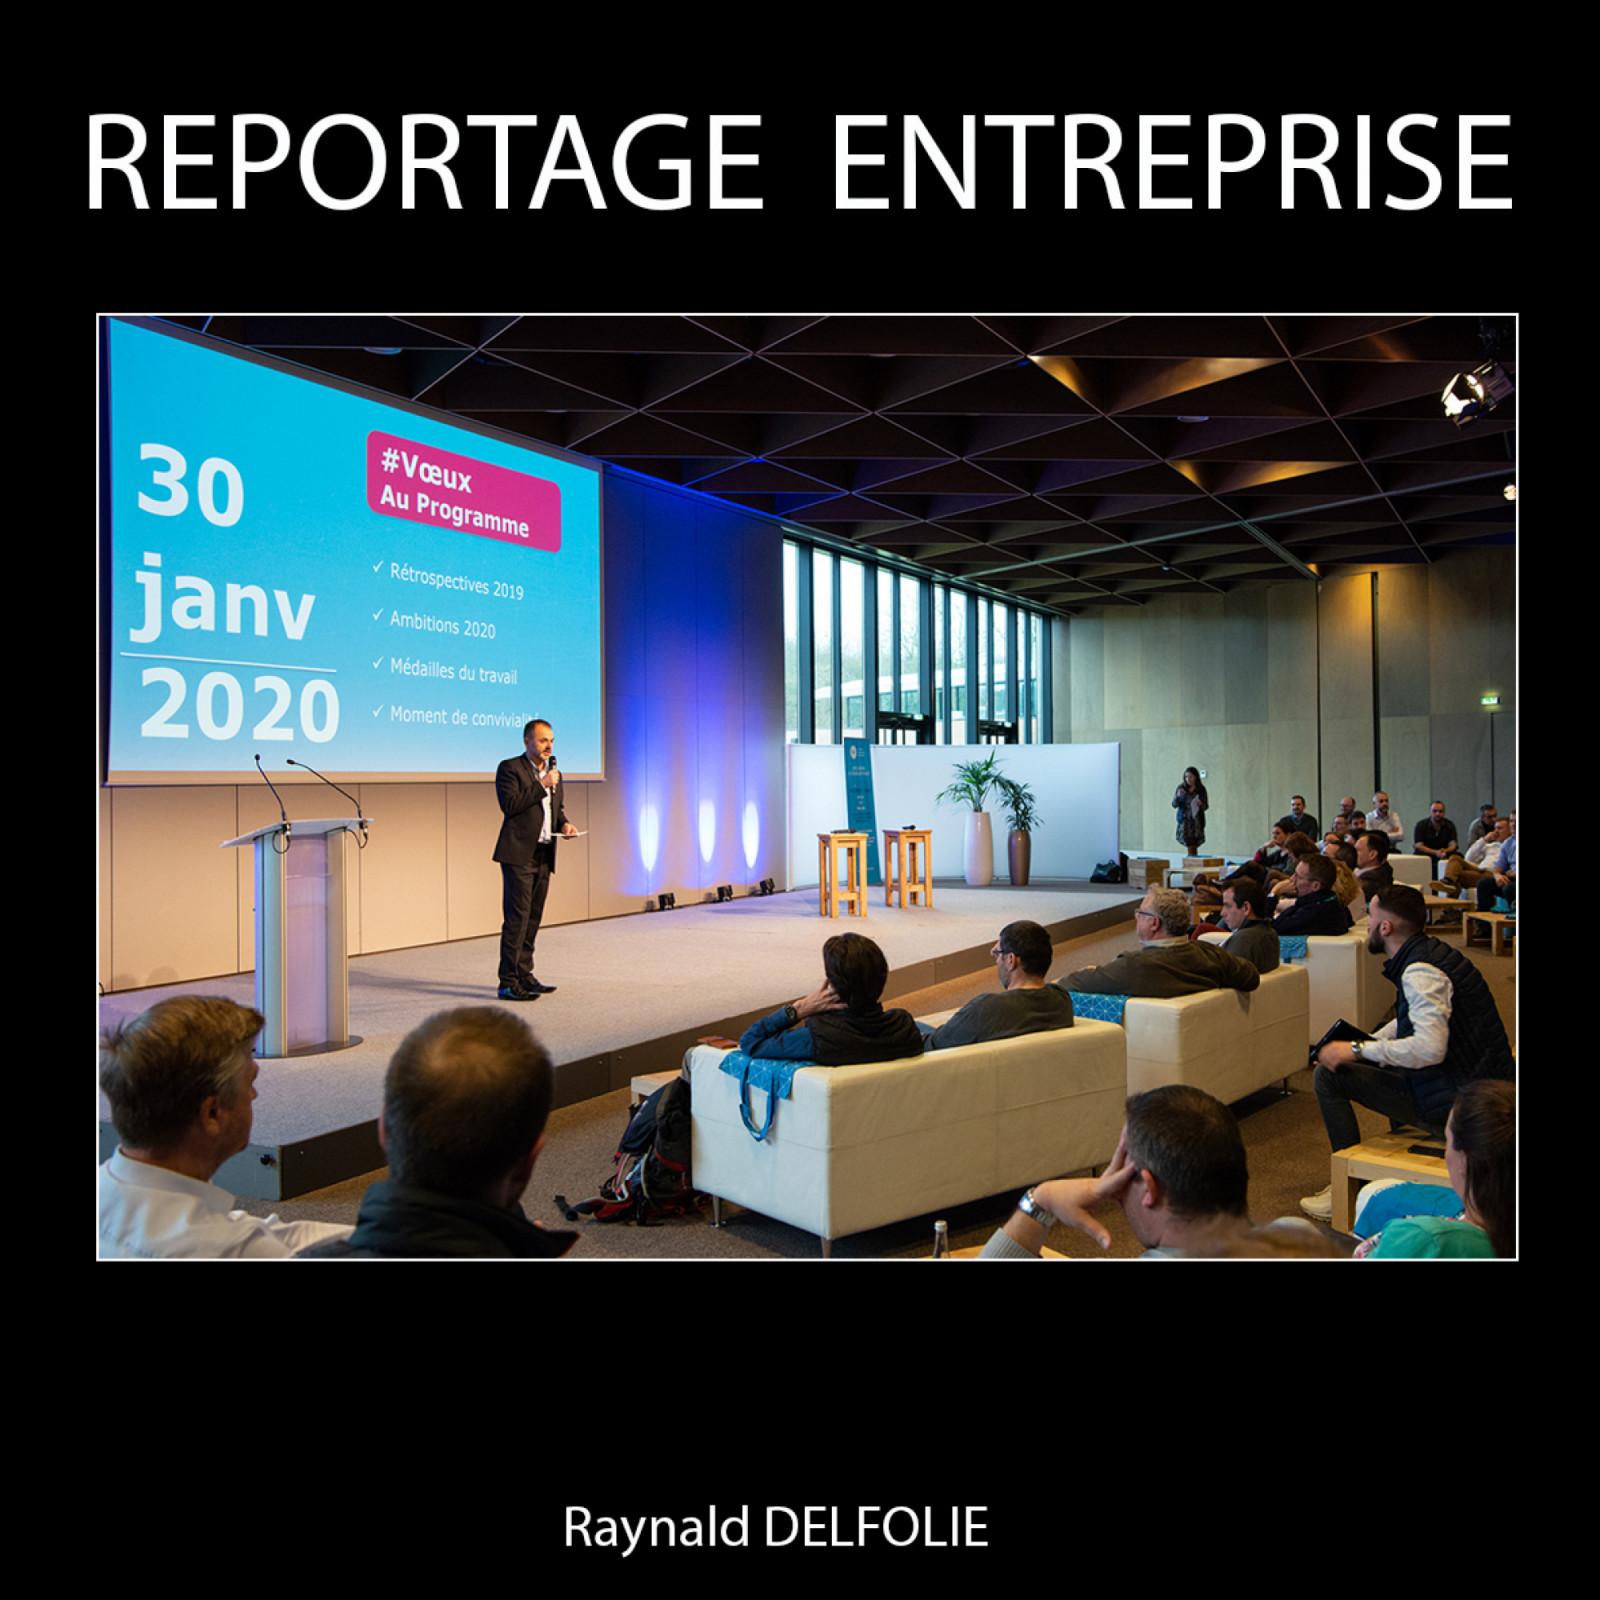 raynald-delfolie 4277492930fa